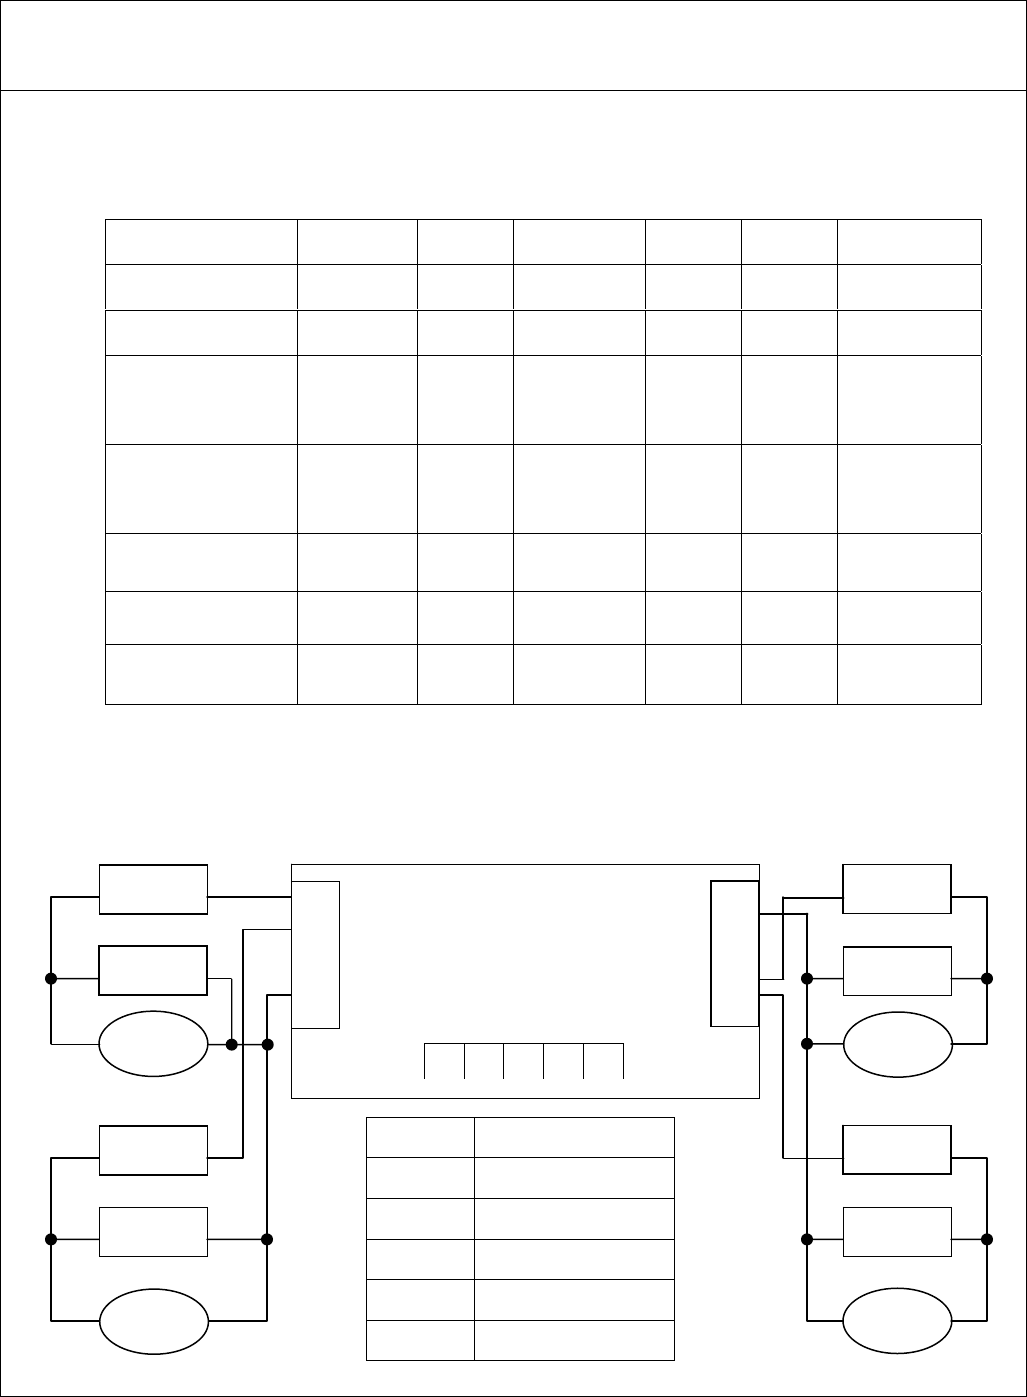 AOC LM-700A DRIVER WINDOWS 7